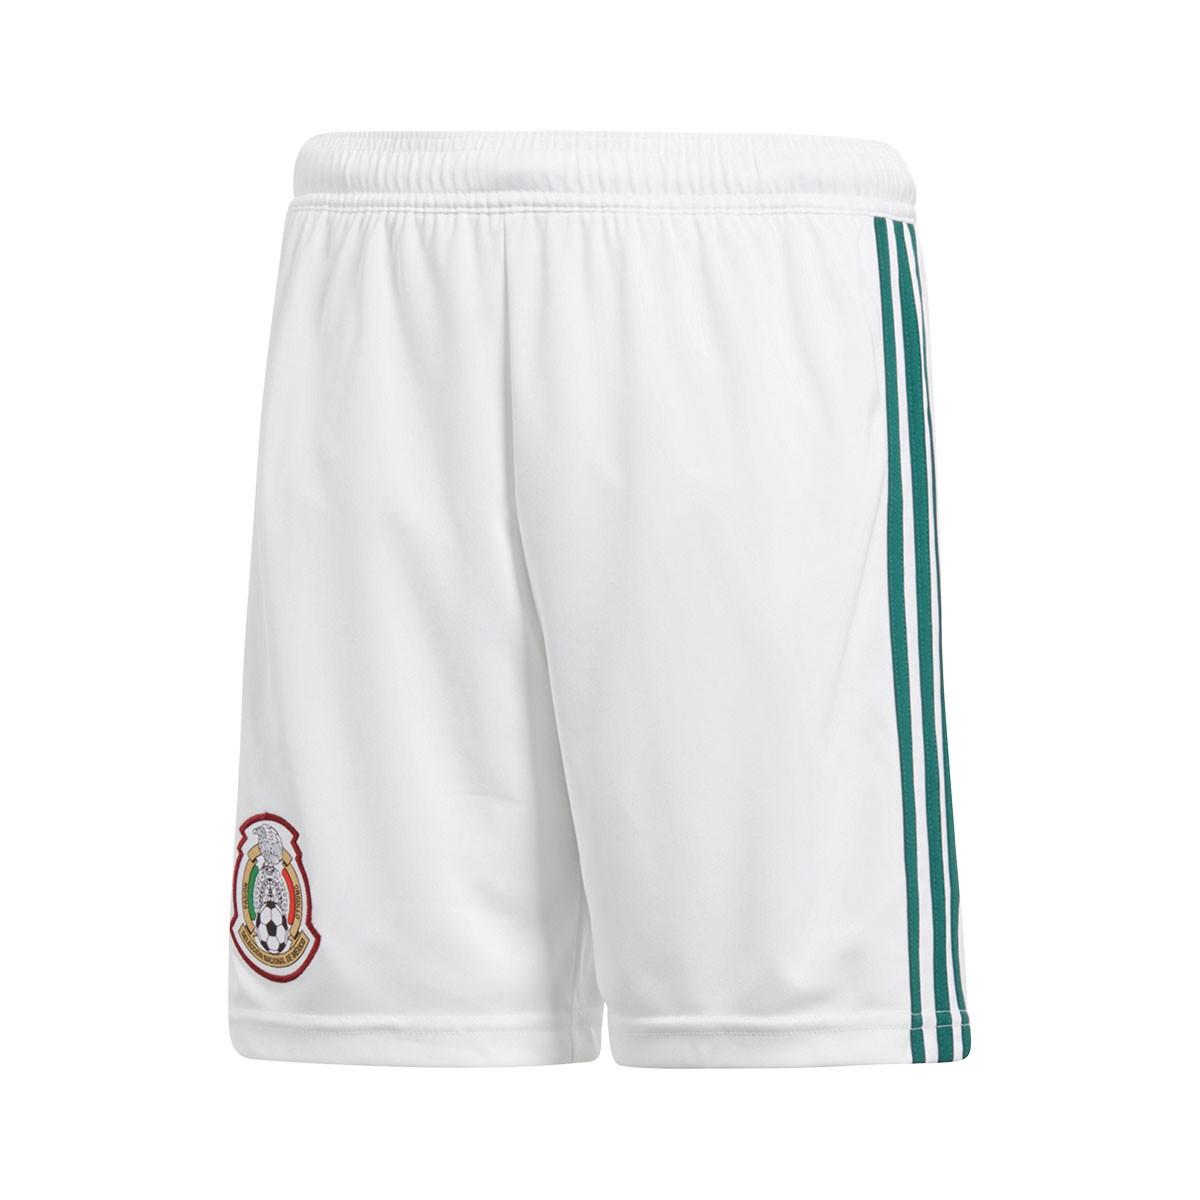 7b53868ec adidas Kids Mexico 2017-2018 Home Shorts. White-Collegiate green ...